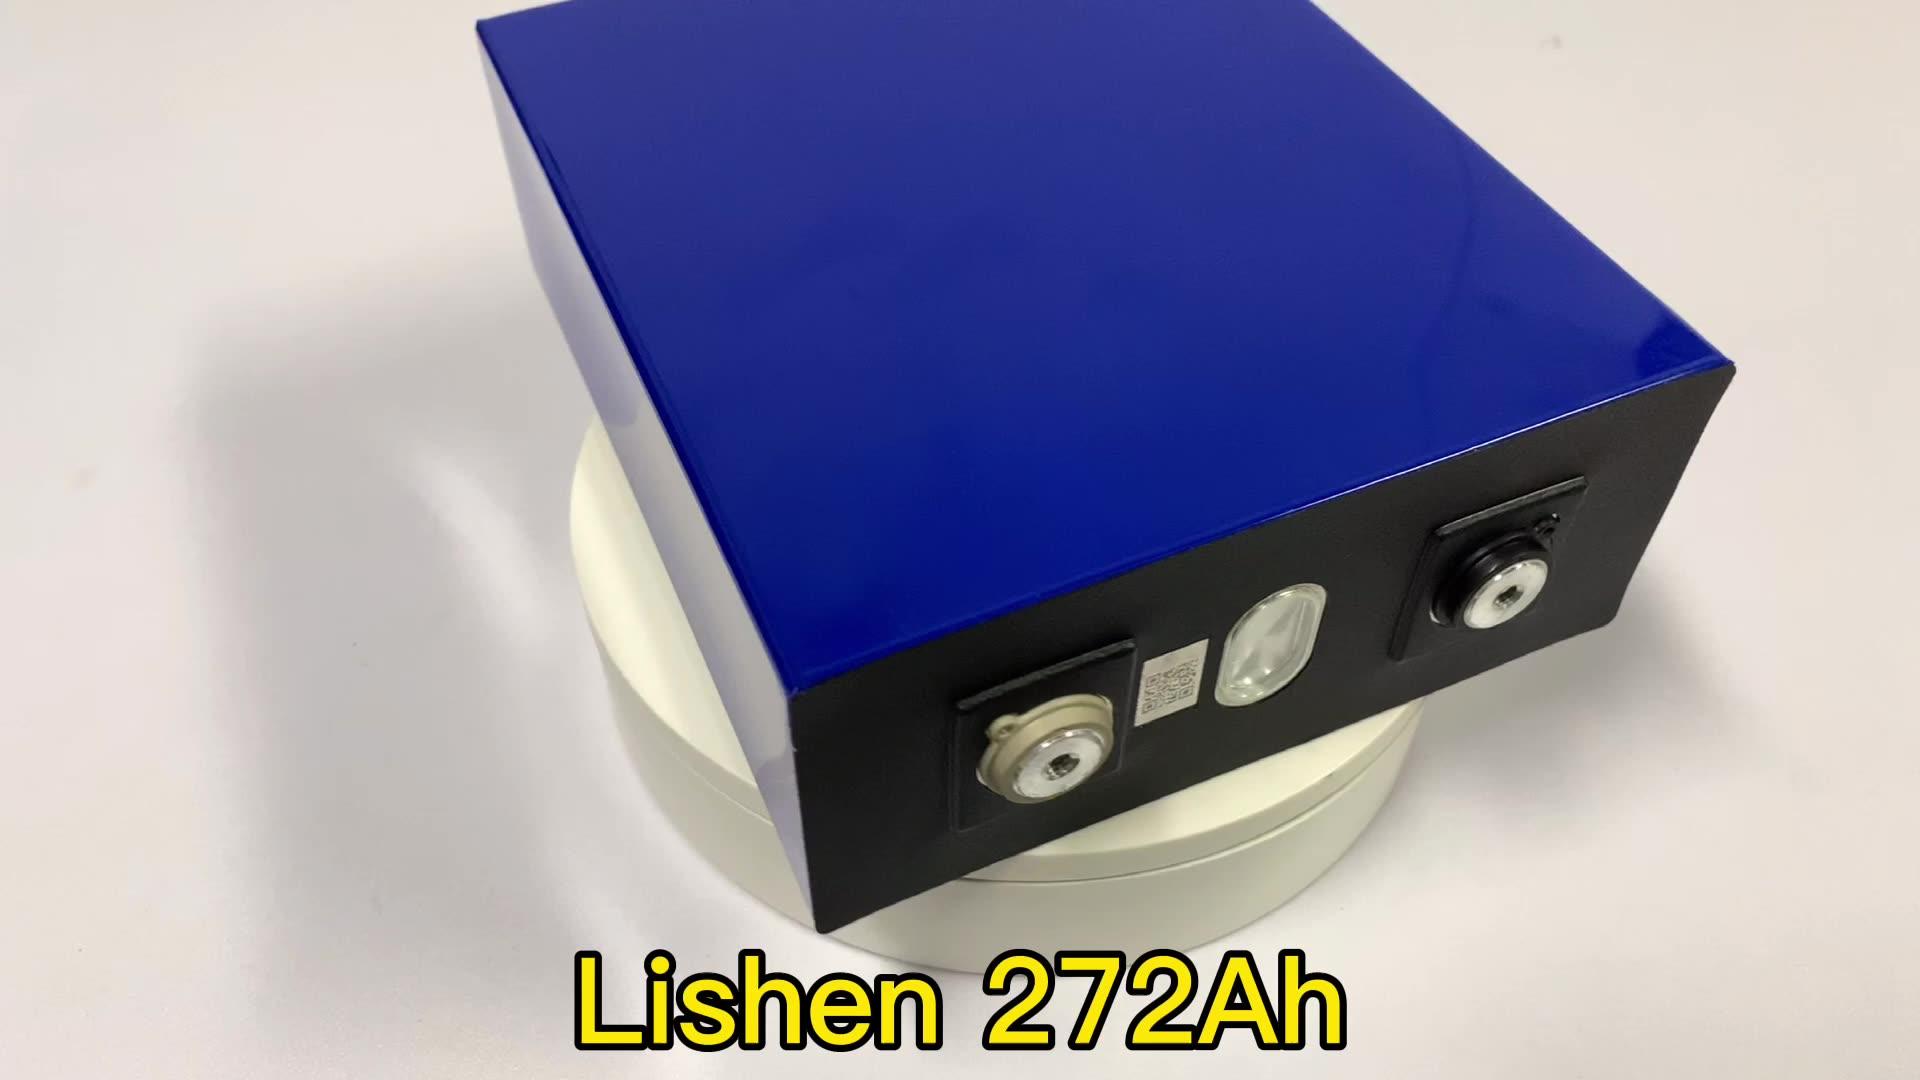 BASEN 1 قطعة Lishen 3.2 فولت 272Ah المنشورية Lifepo4 بطارية لتقوم بها بنفسك 12 فولت 24 فولت 48 فولت بطارية شحن الطاقة الشمسية